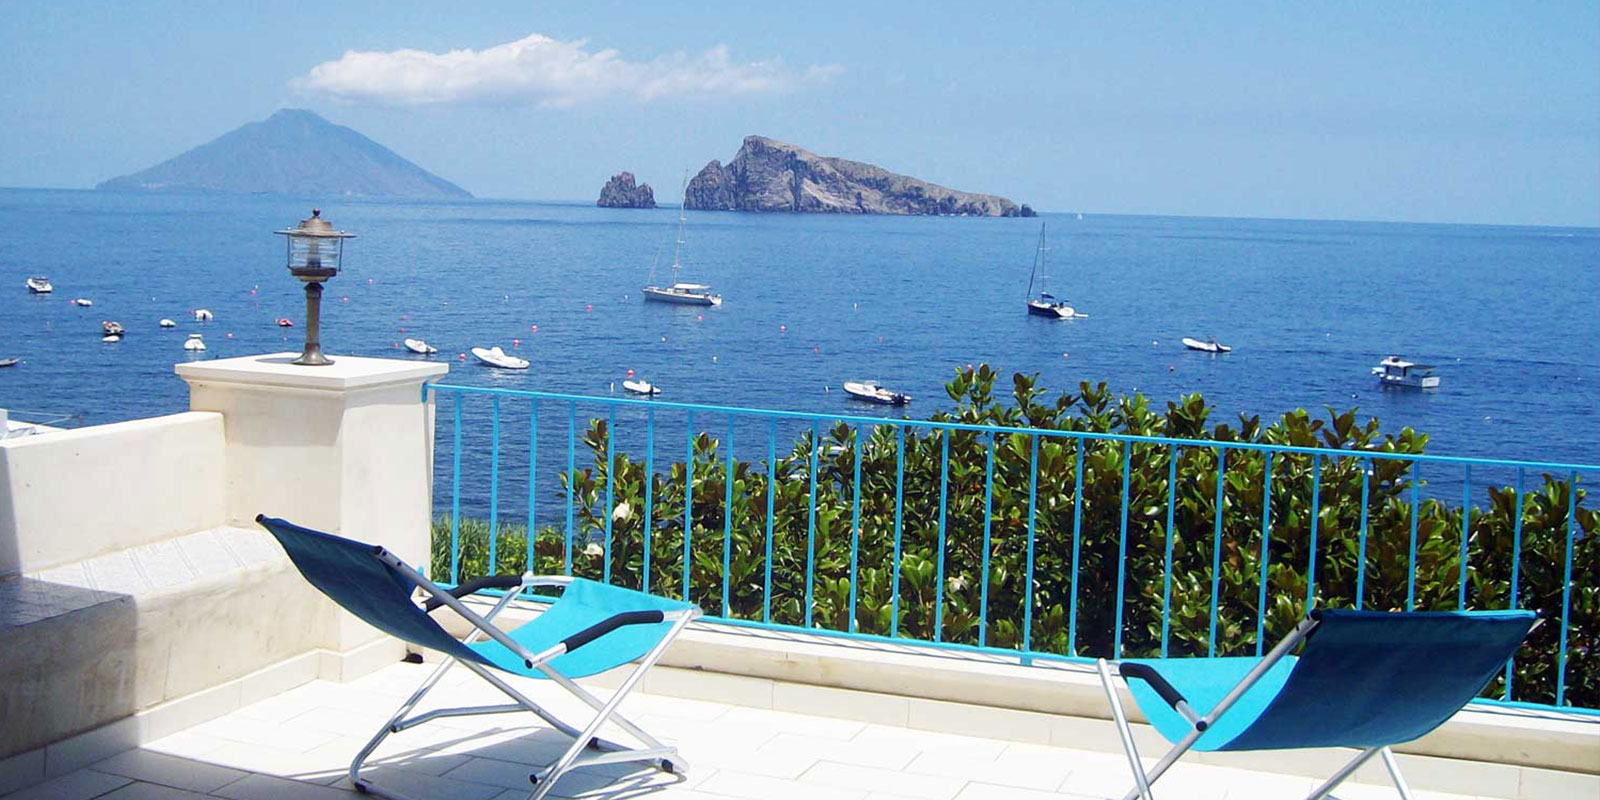 Hotel Villa Morgana Resort Spa - Panarea e Stromboli by night